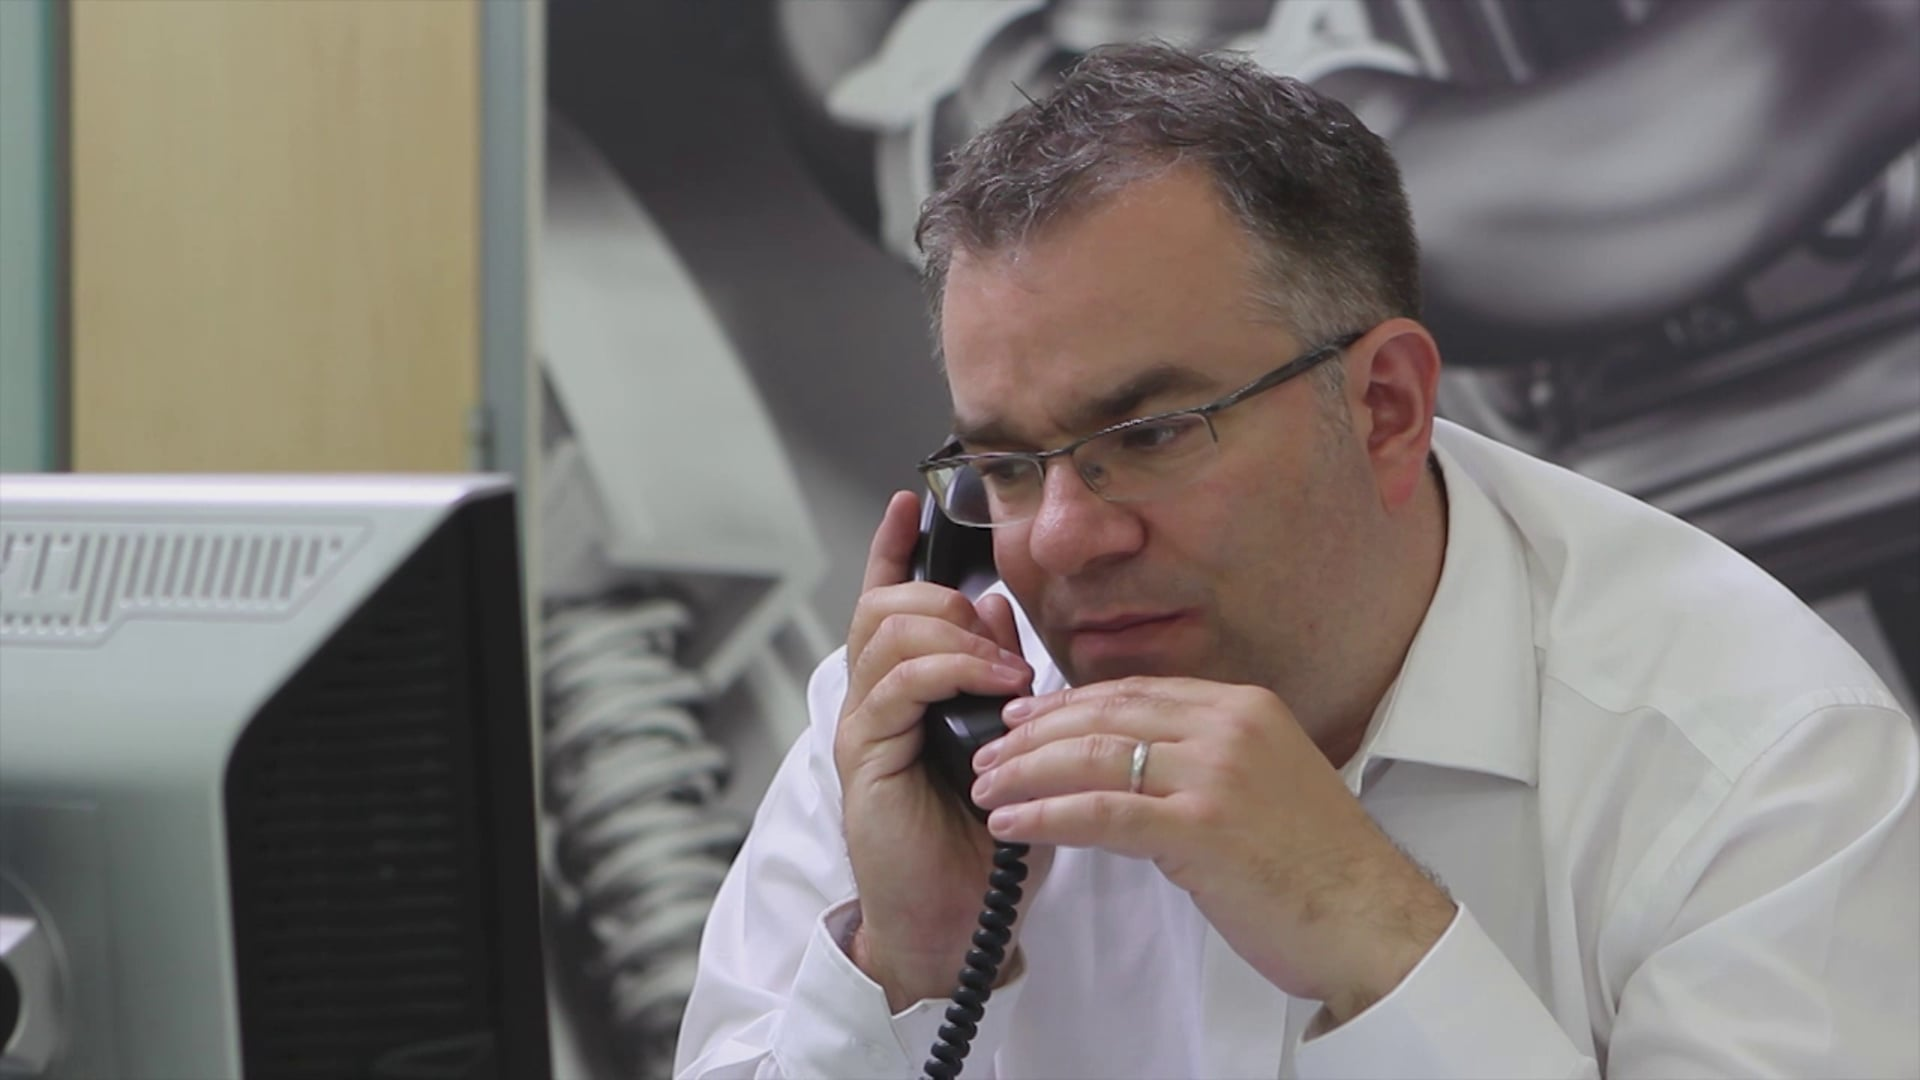 Audi 'Goodwill' Telephone Call